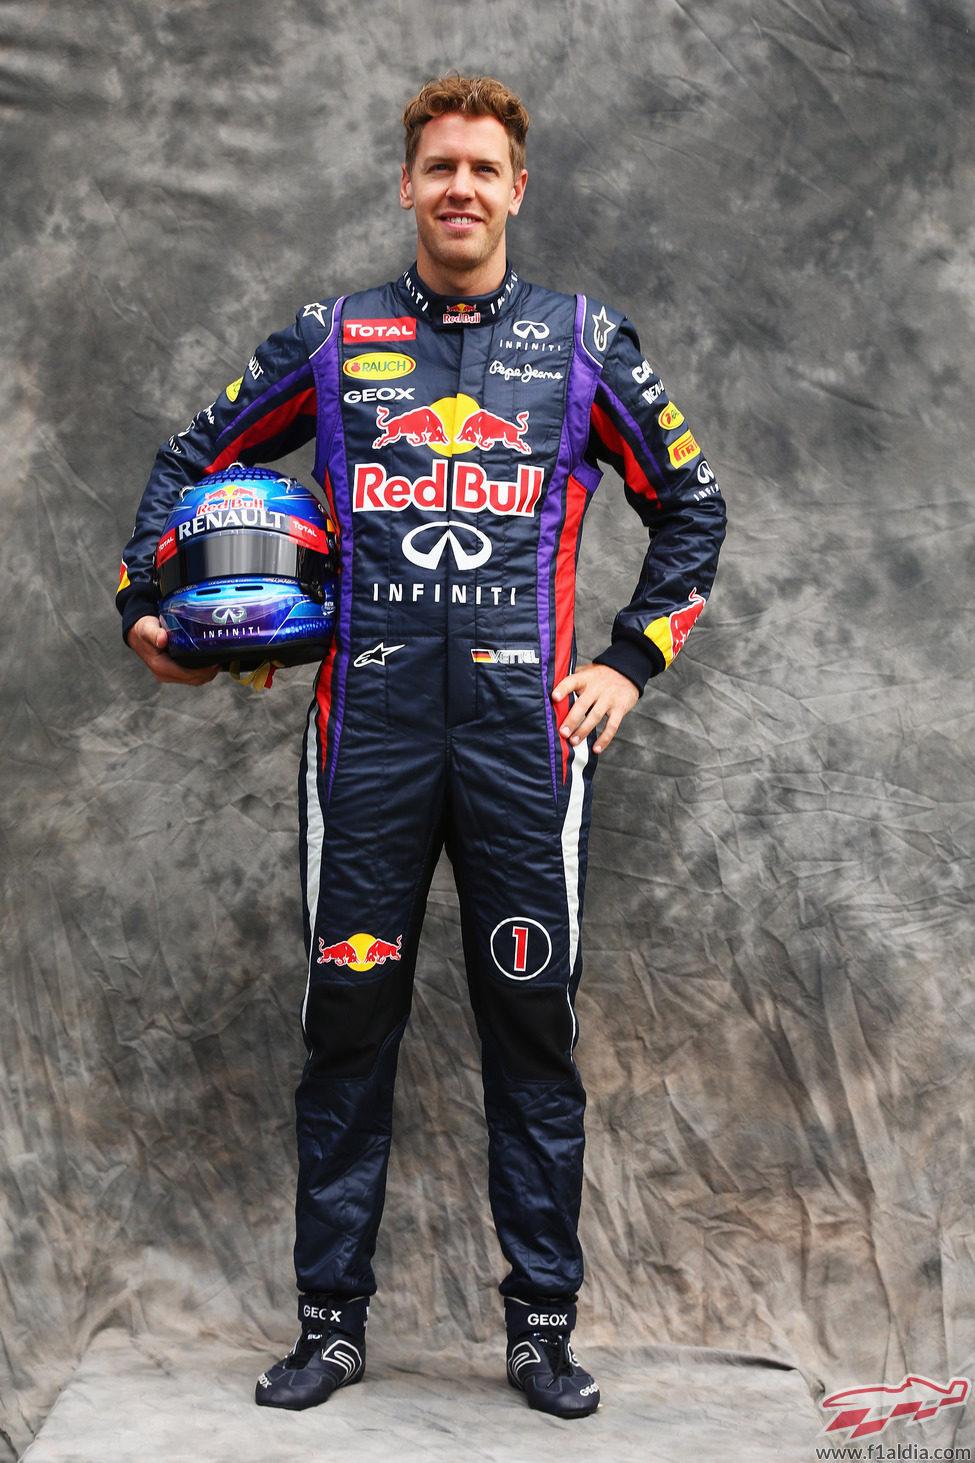 Piloto Red Bull 2013 Como Piloto de Red Bull